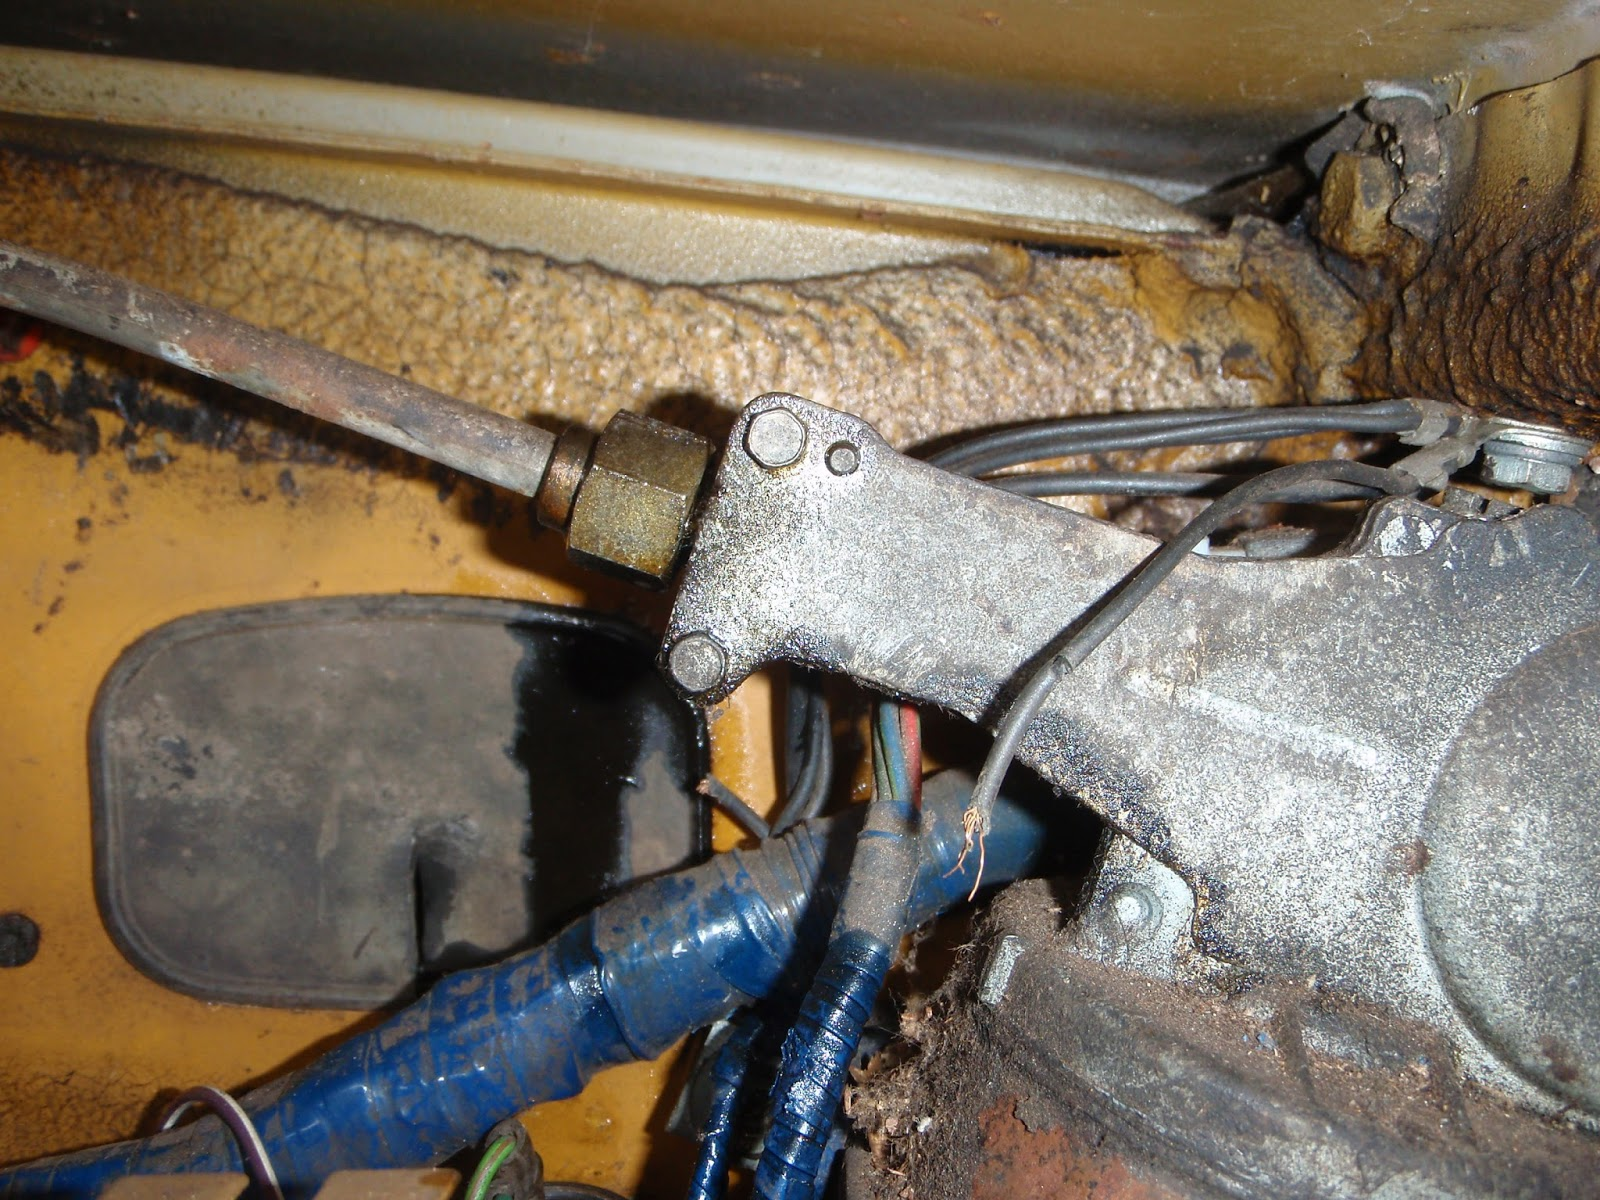 driving lights wiring diagram integra alarm mgb in the garage: june 2013